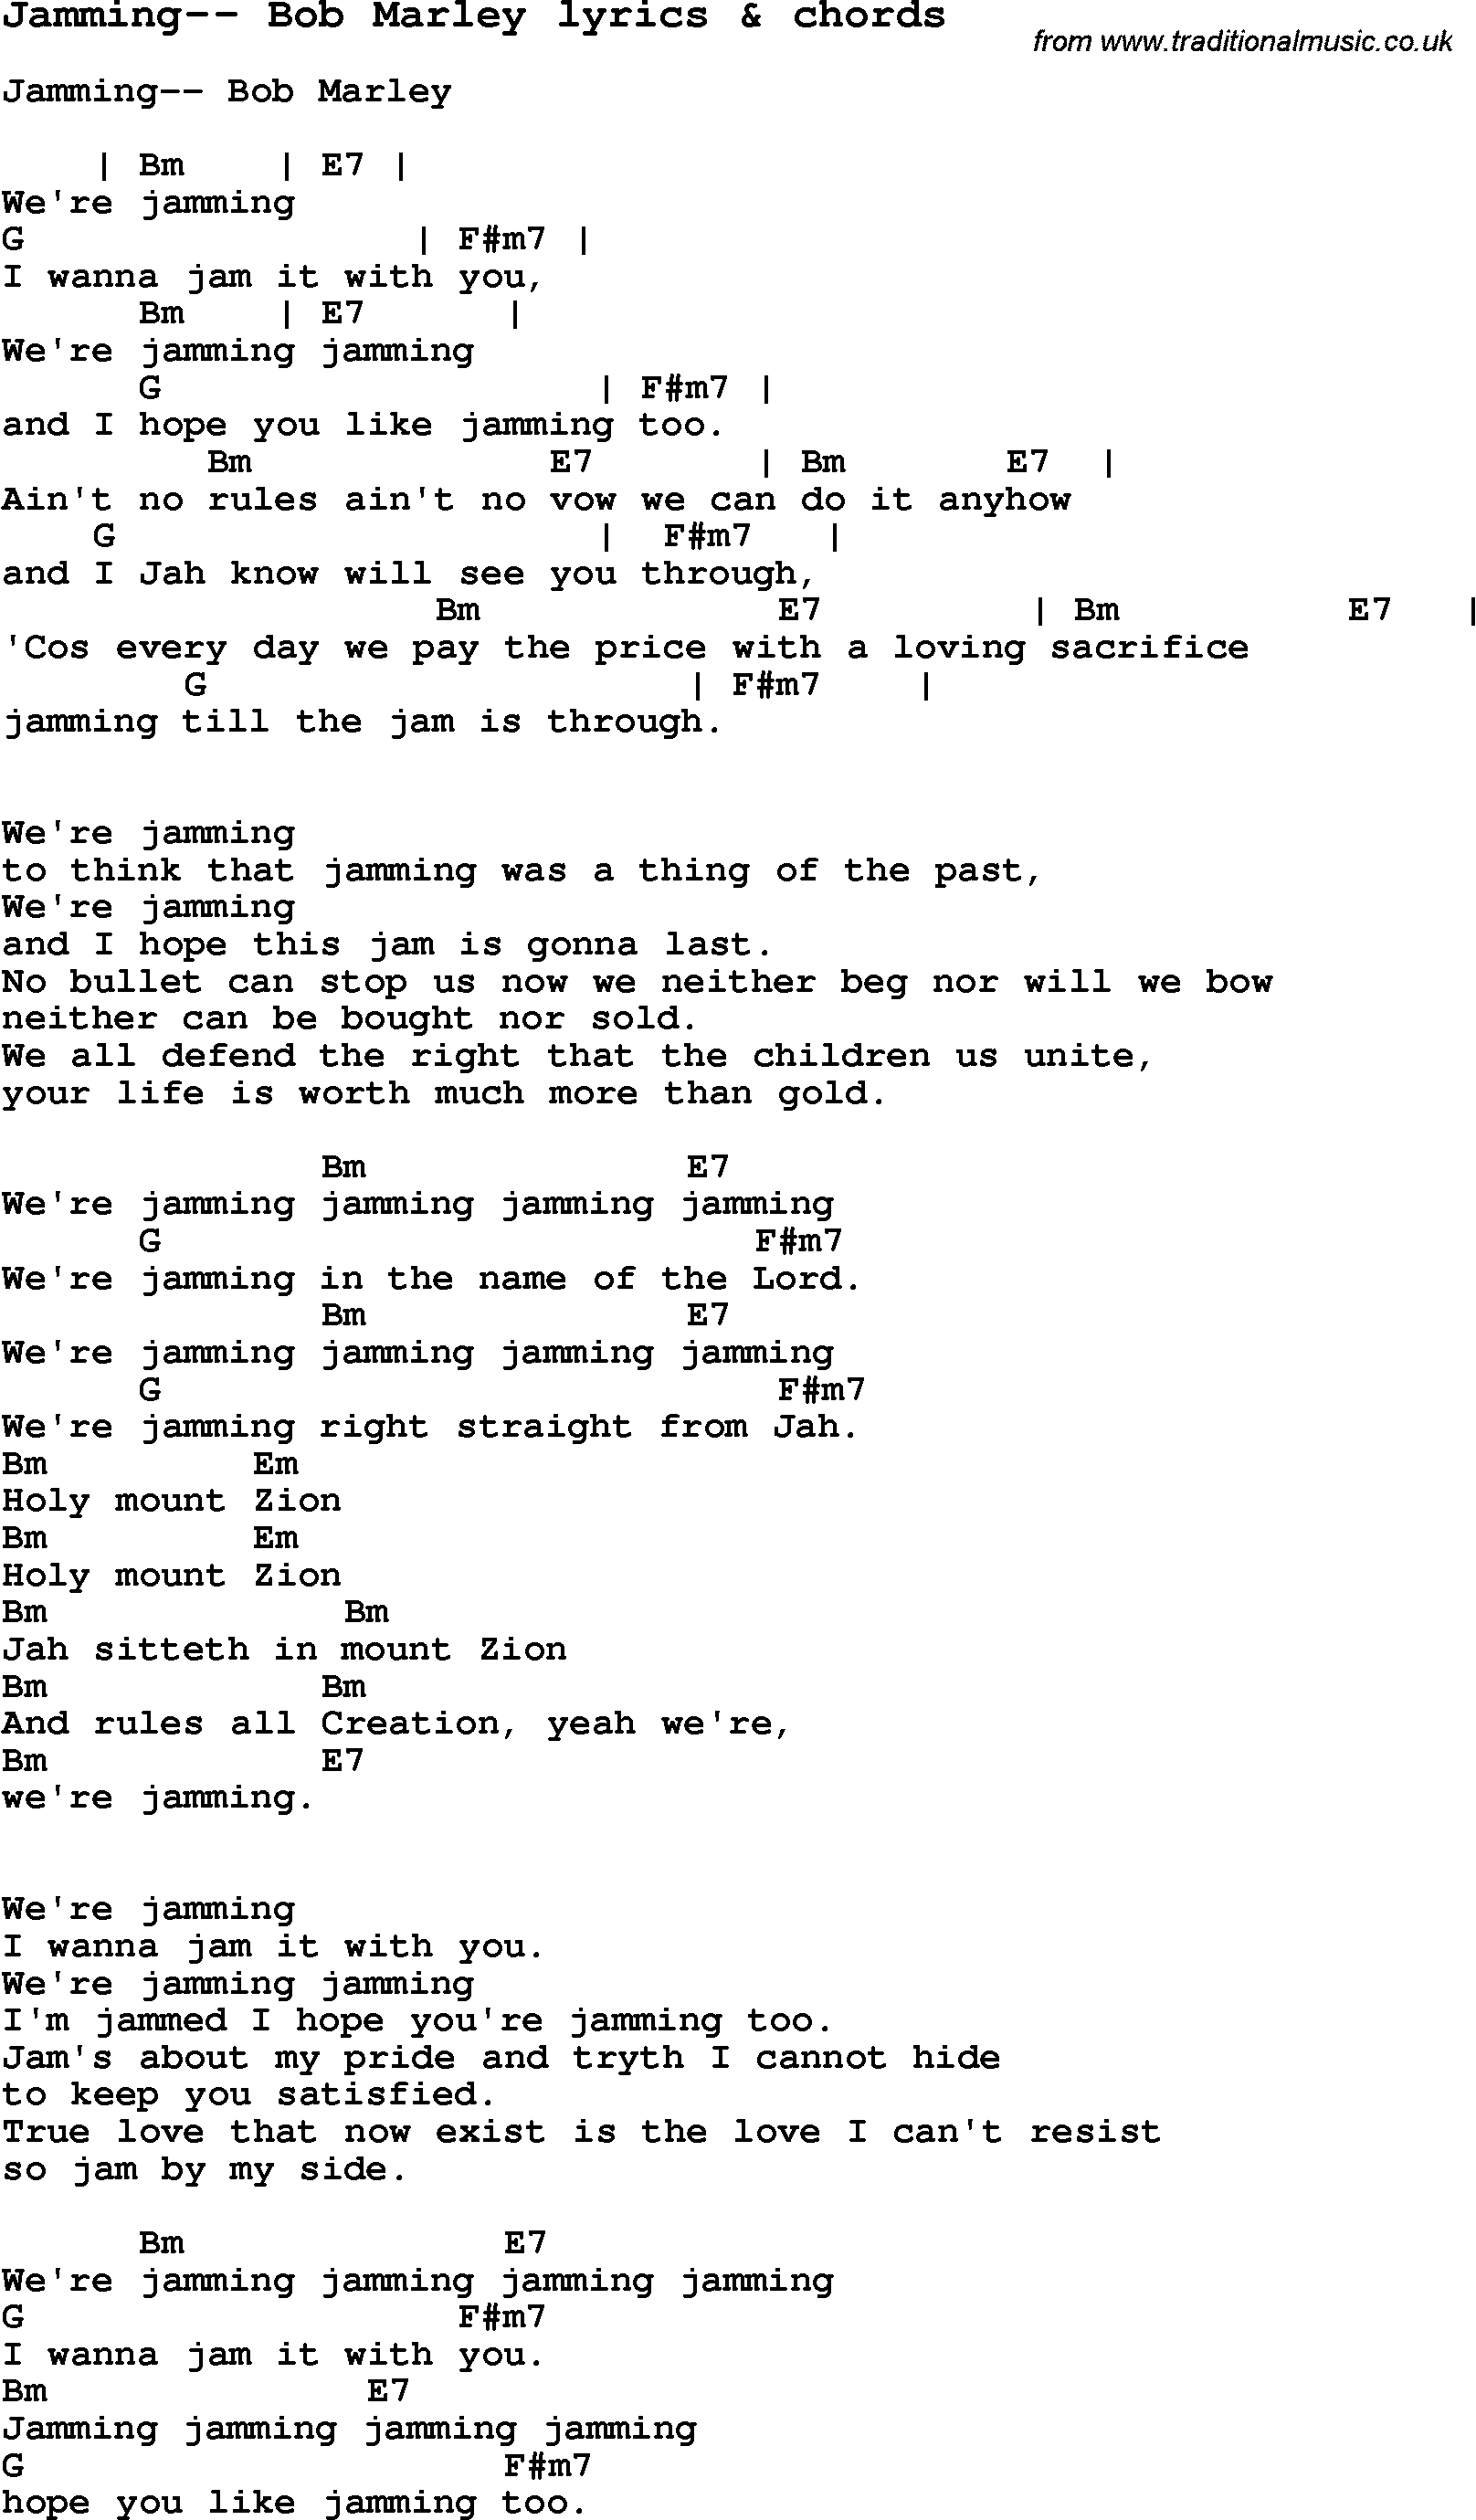 Love Song Lyrics For Jamming Bob Marley With Chords For Ukulele Guitar Banjo Etc Lyrics And Chords Bob Marley Lyrics Guitar Chords For Songs